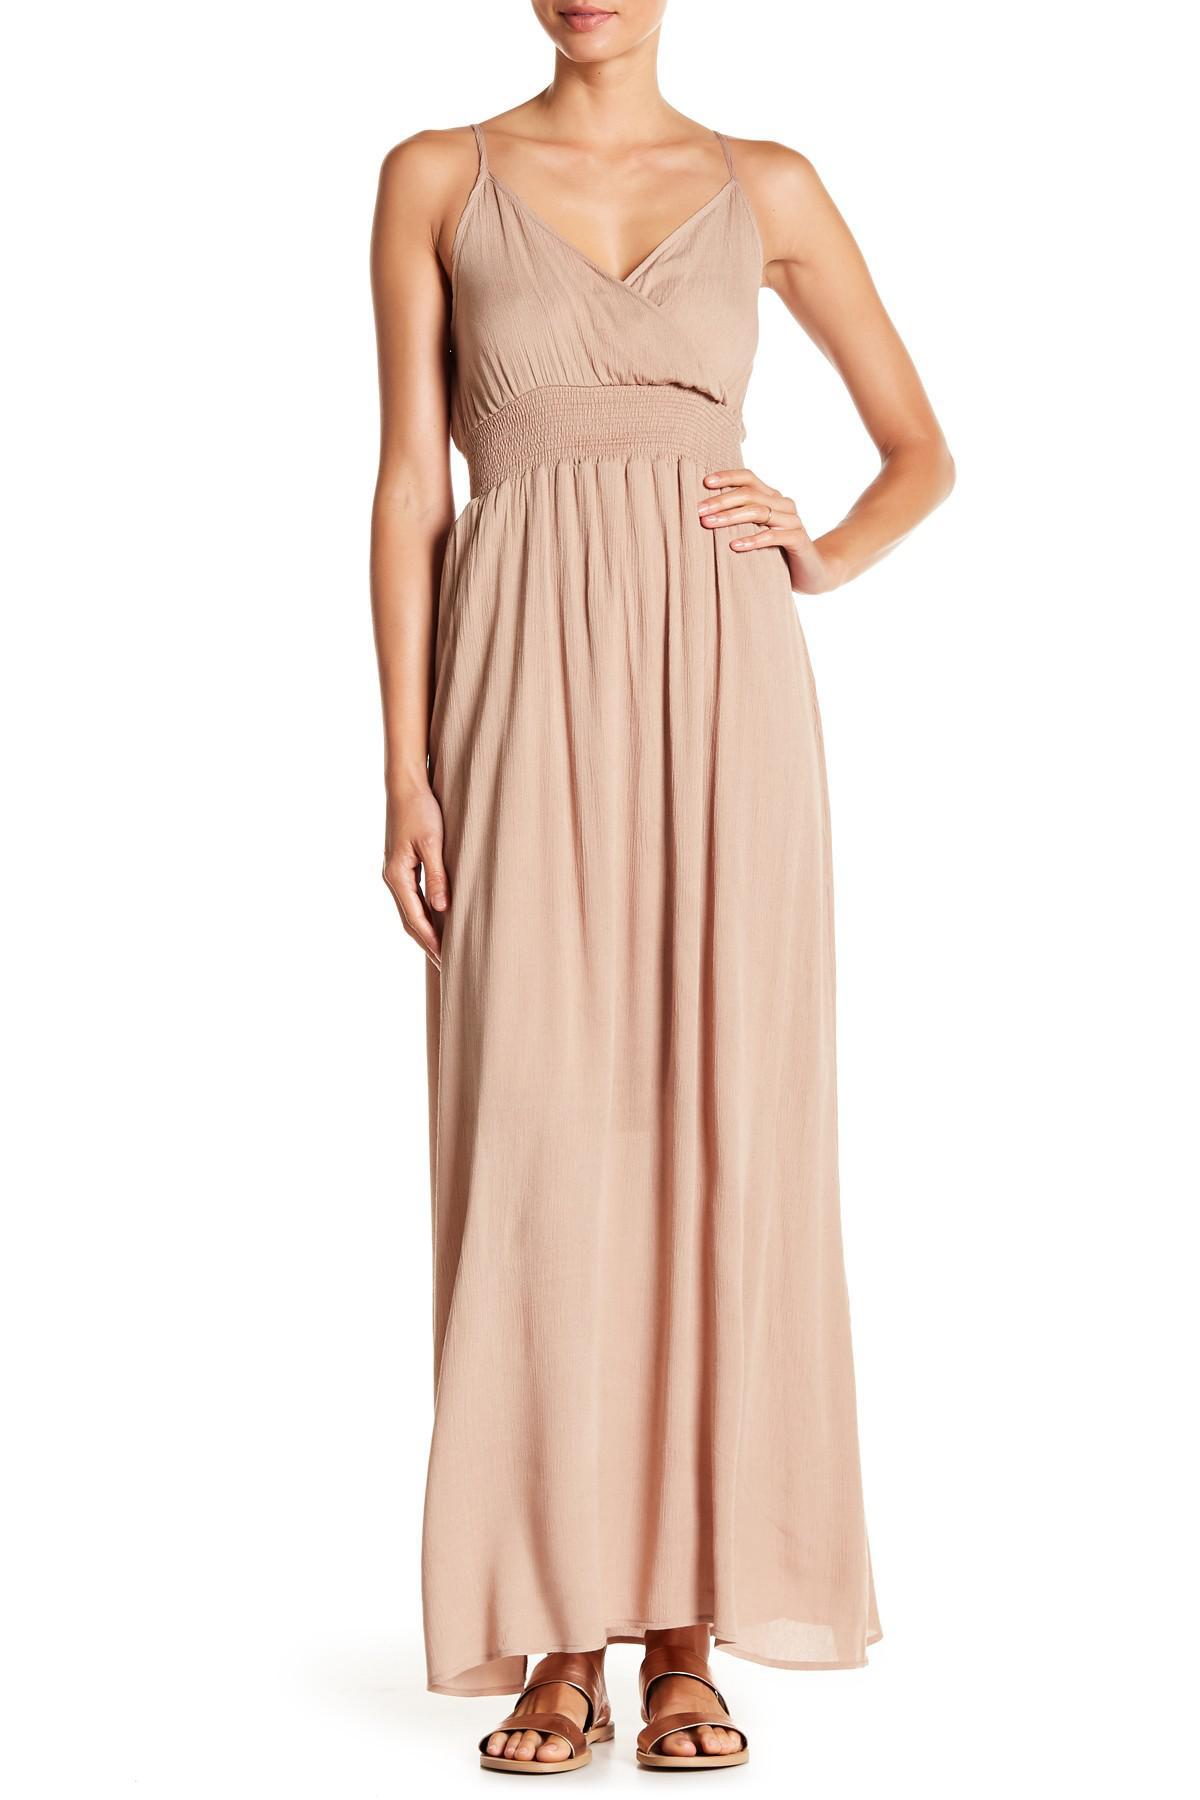 3f6058660f2 Lyst - West Kei Gauze Maxi Dress in Pink